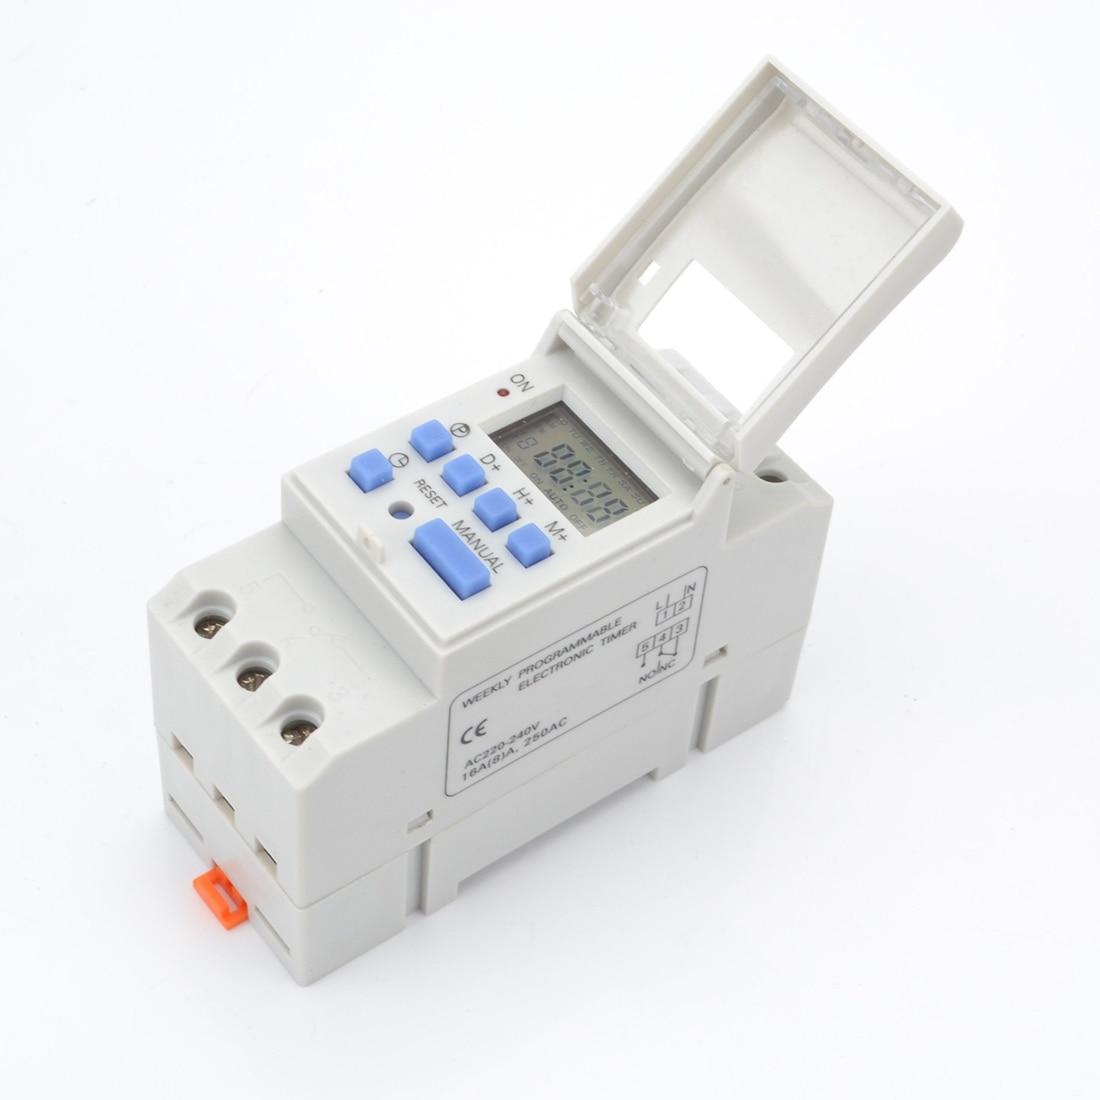 Digital LCD Power Timer 7 Days Programmable Time Switch AC 220V / 110V  DC 12V 16A Temporizador Din Rail Timer Switch